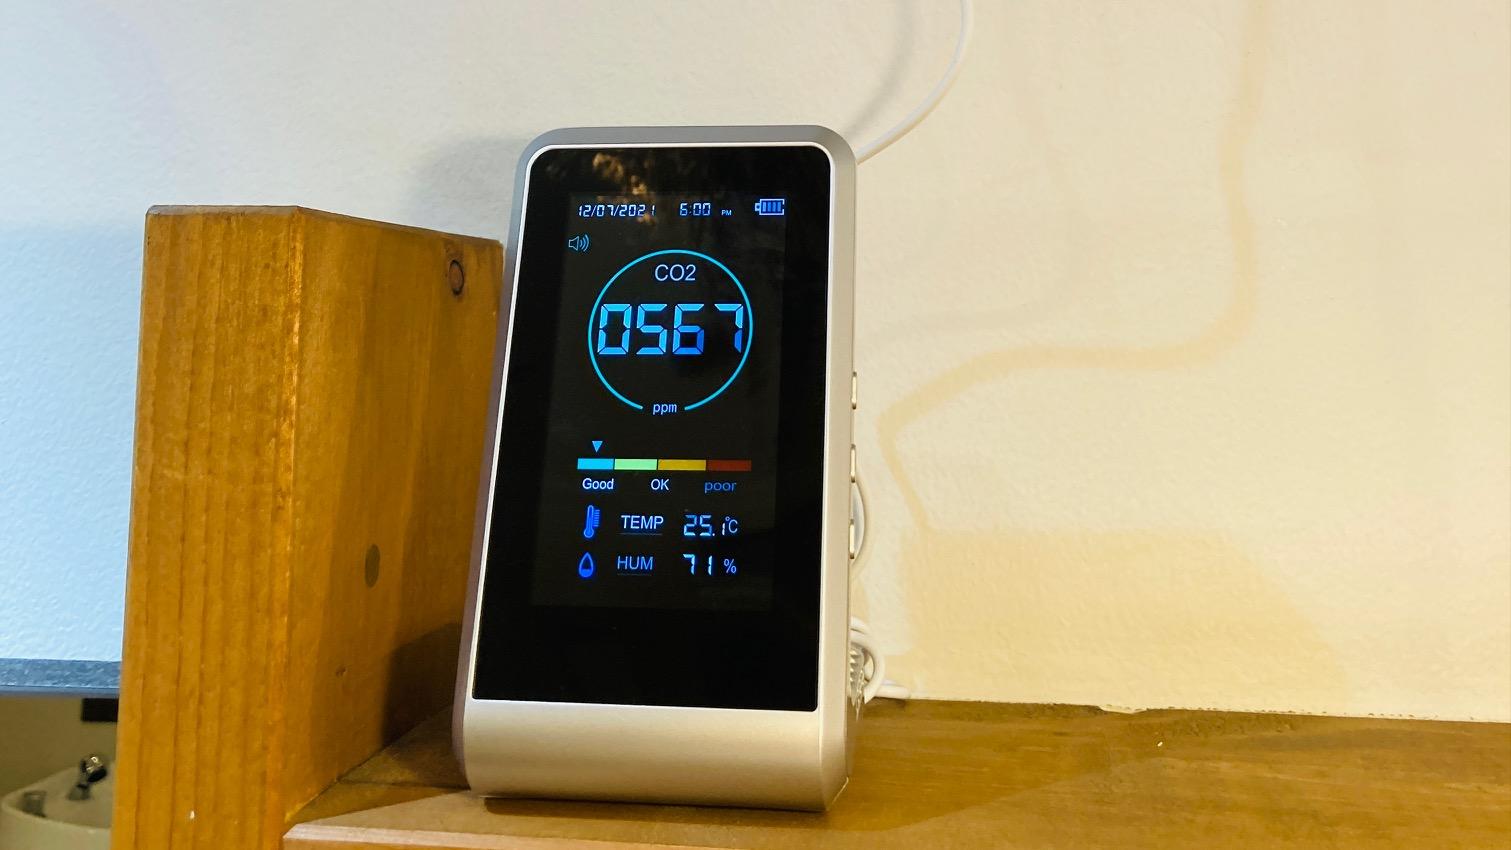 CHAINONにもCO2マネージャー・二酸化炭素濃度測定器がやってきました!(^^)!